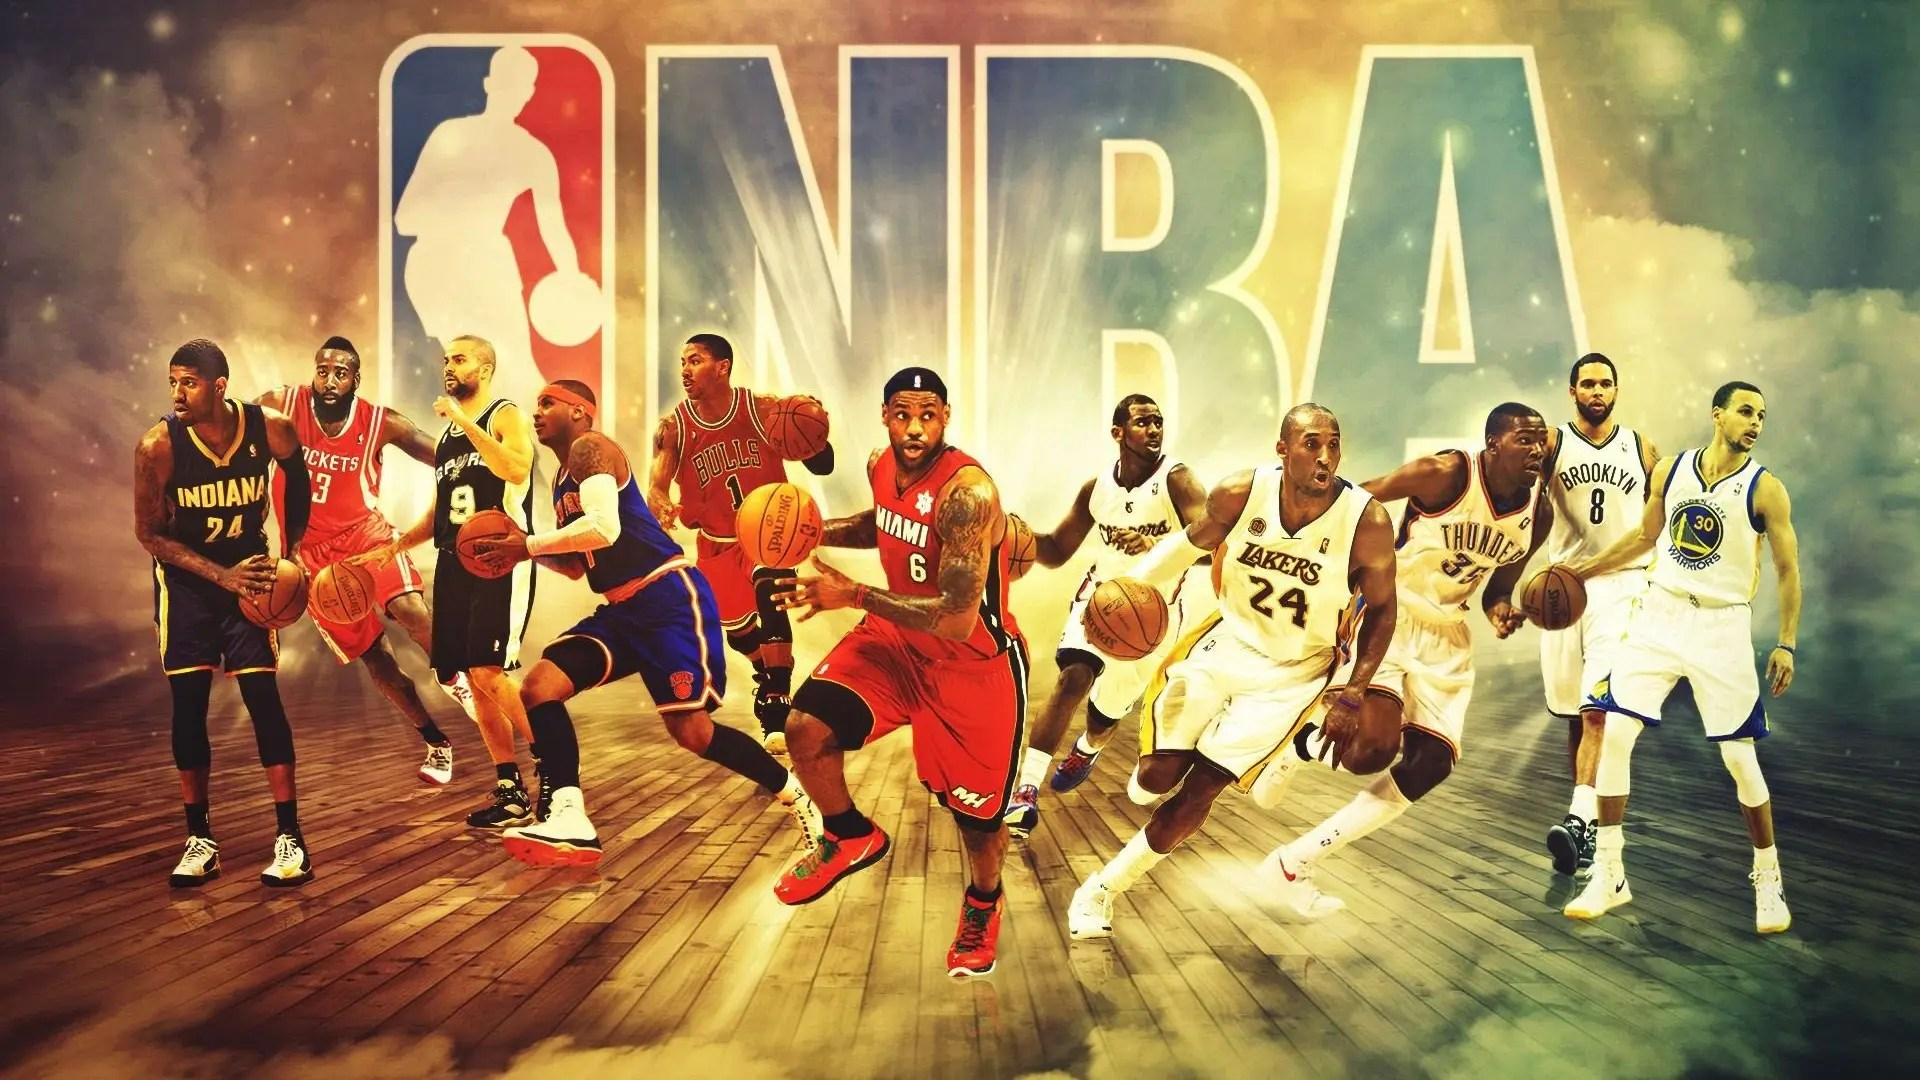 Rudy Gobert atteint du coronavirus, la saison régulière suspendue — NBA